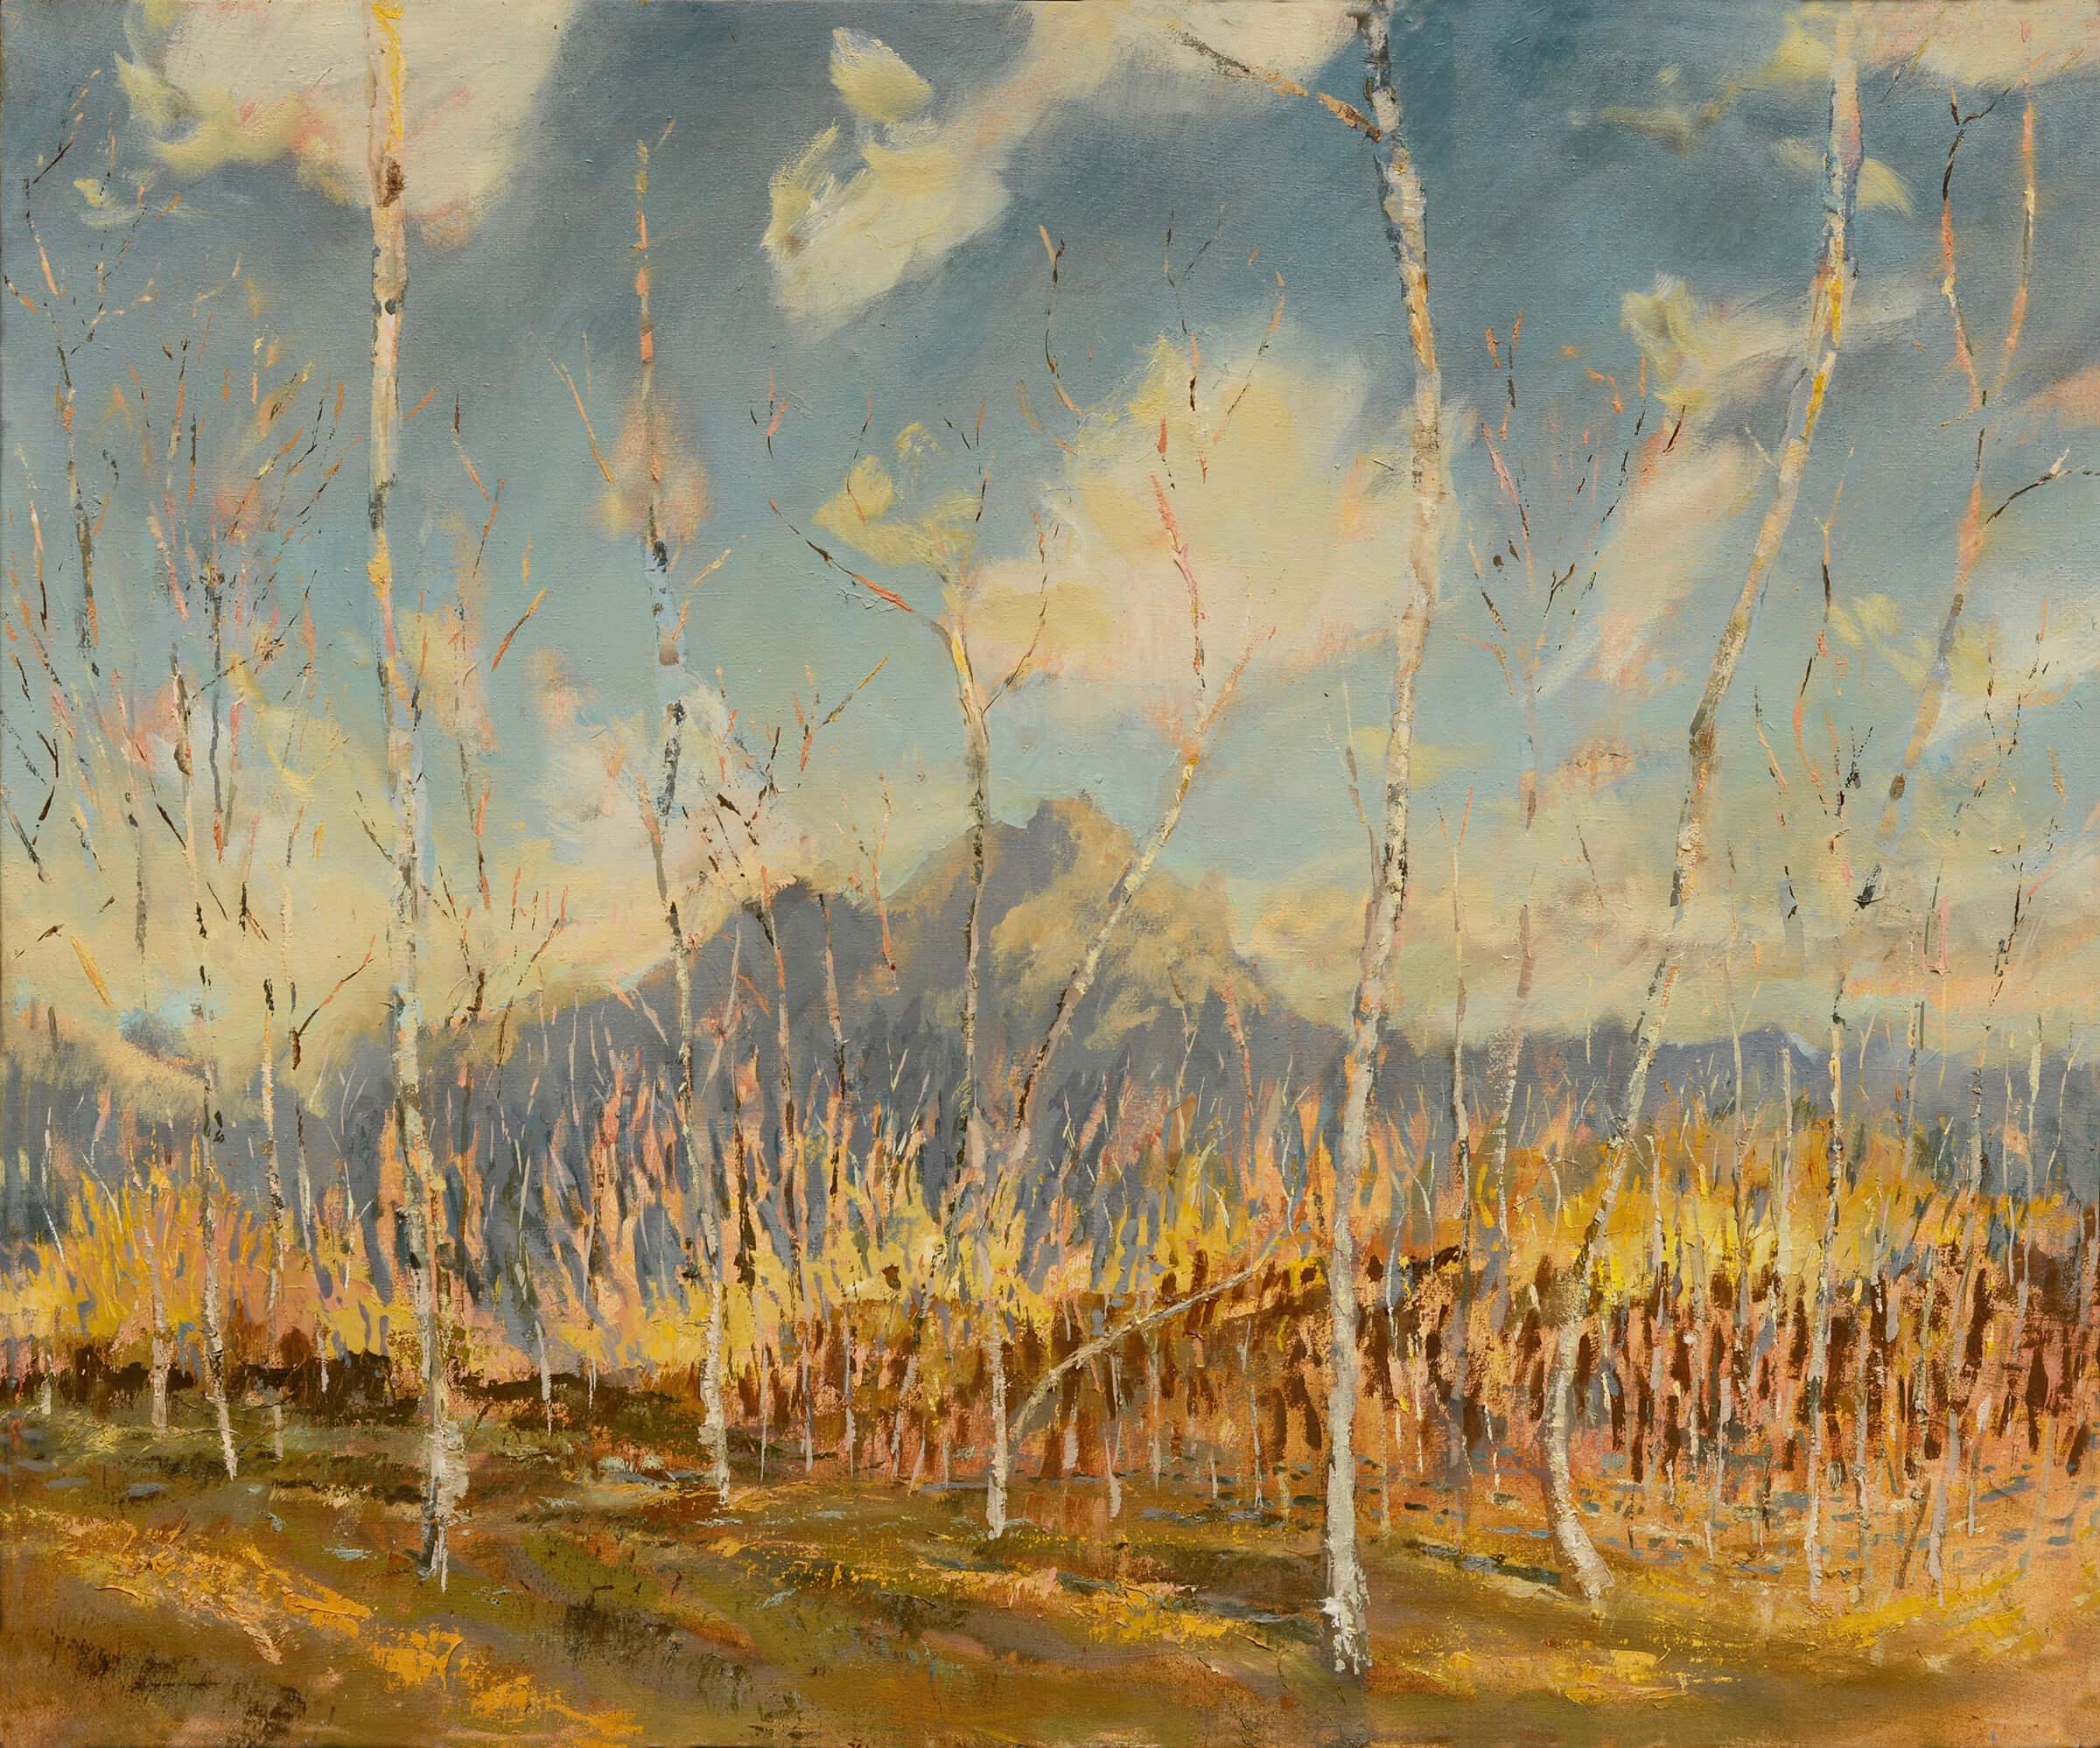 RHSK091 Ogura San beyond Birch forest Autumn Evening ( Oil on Linen ) 92 x 110 cm